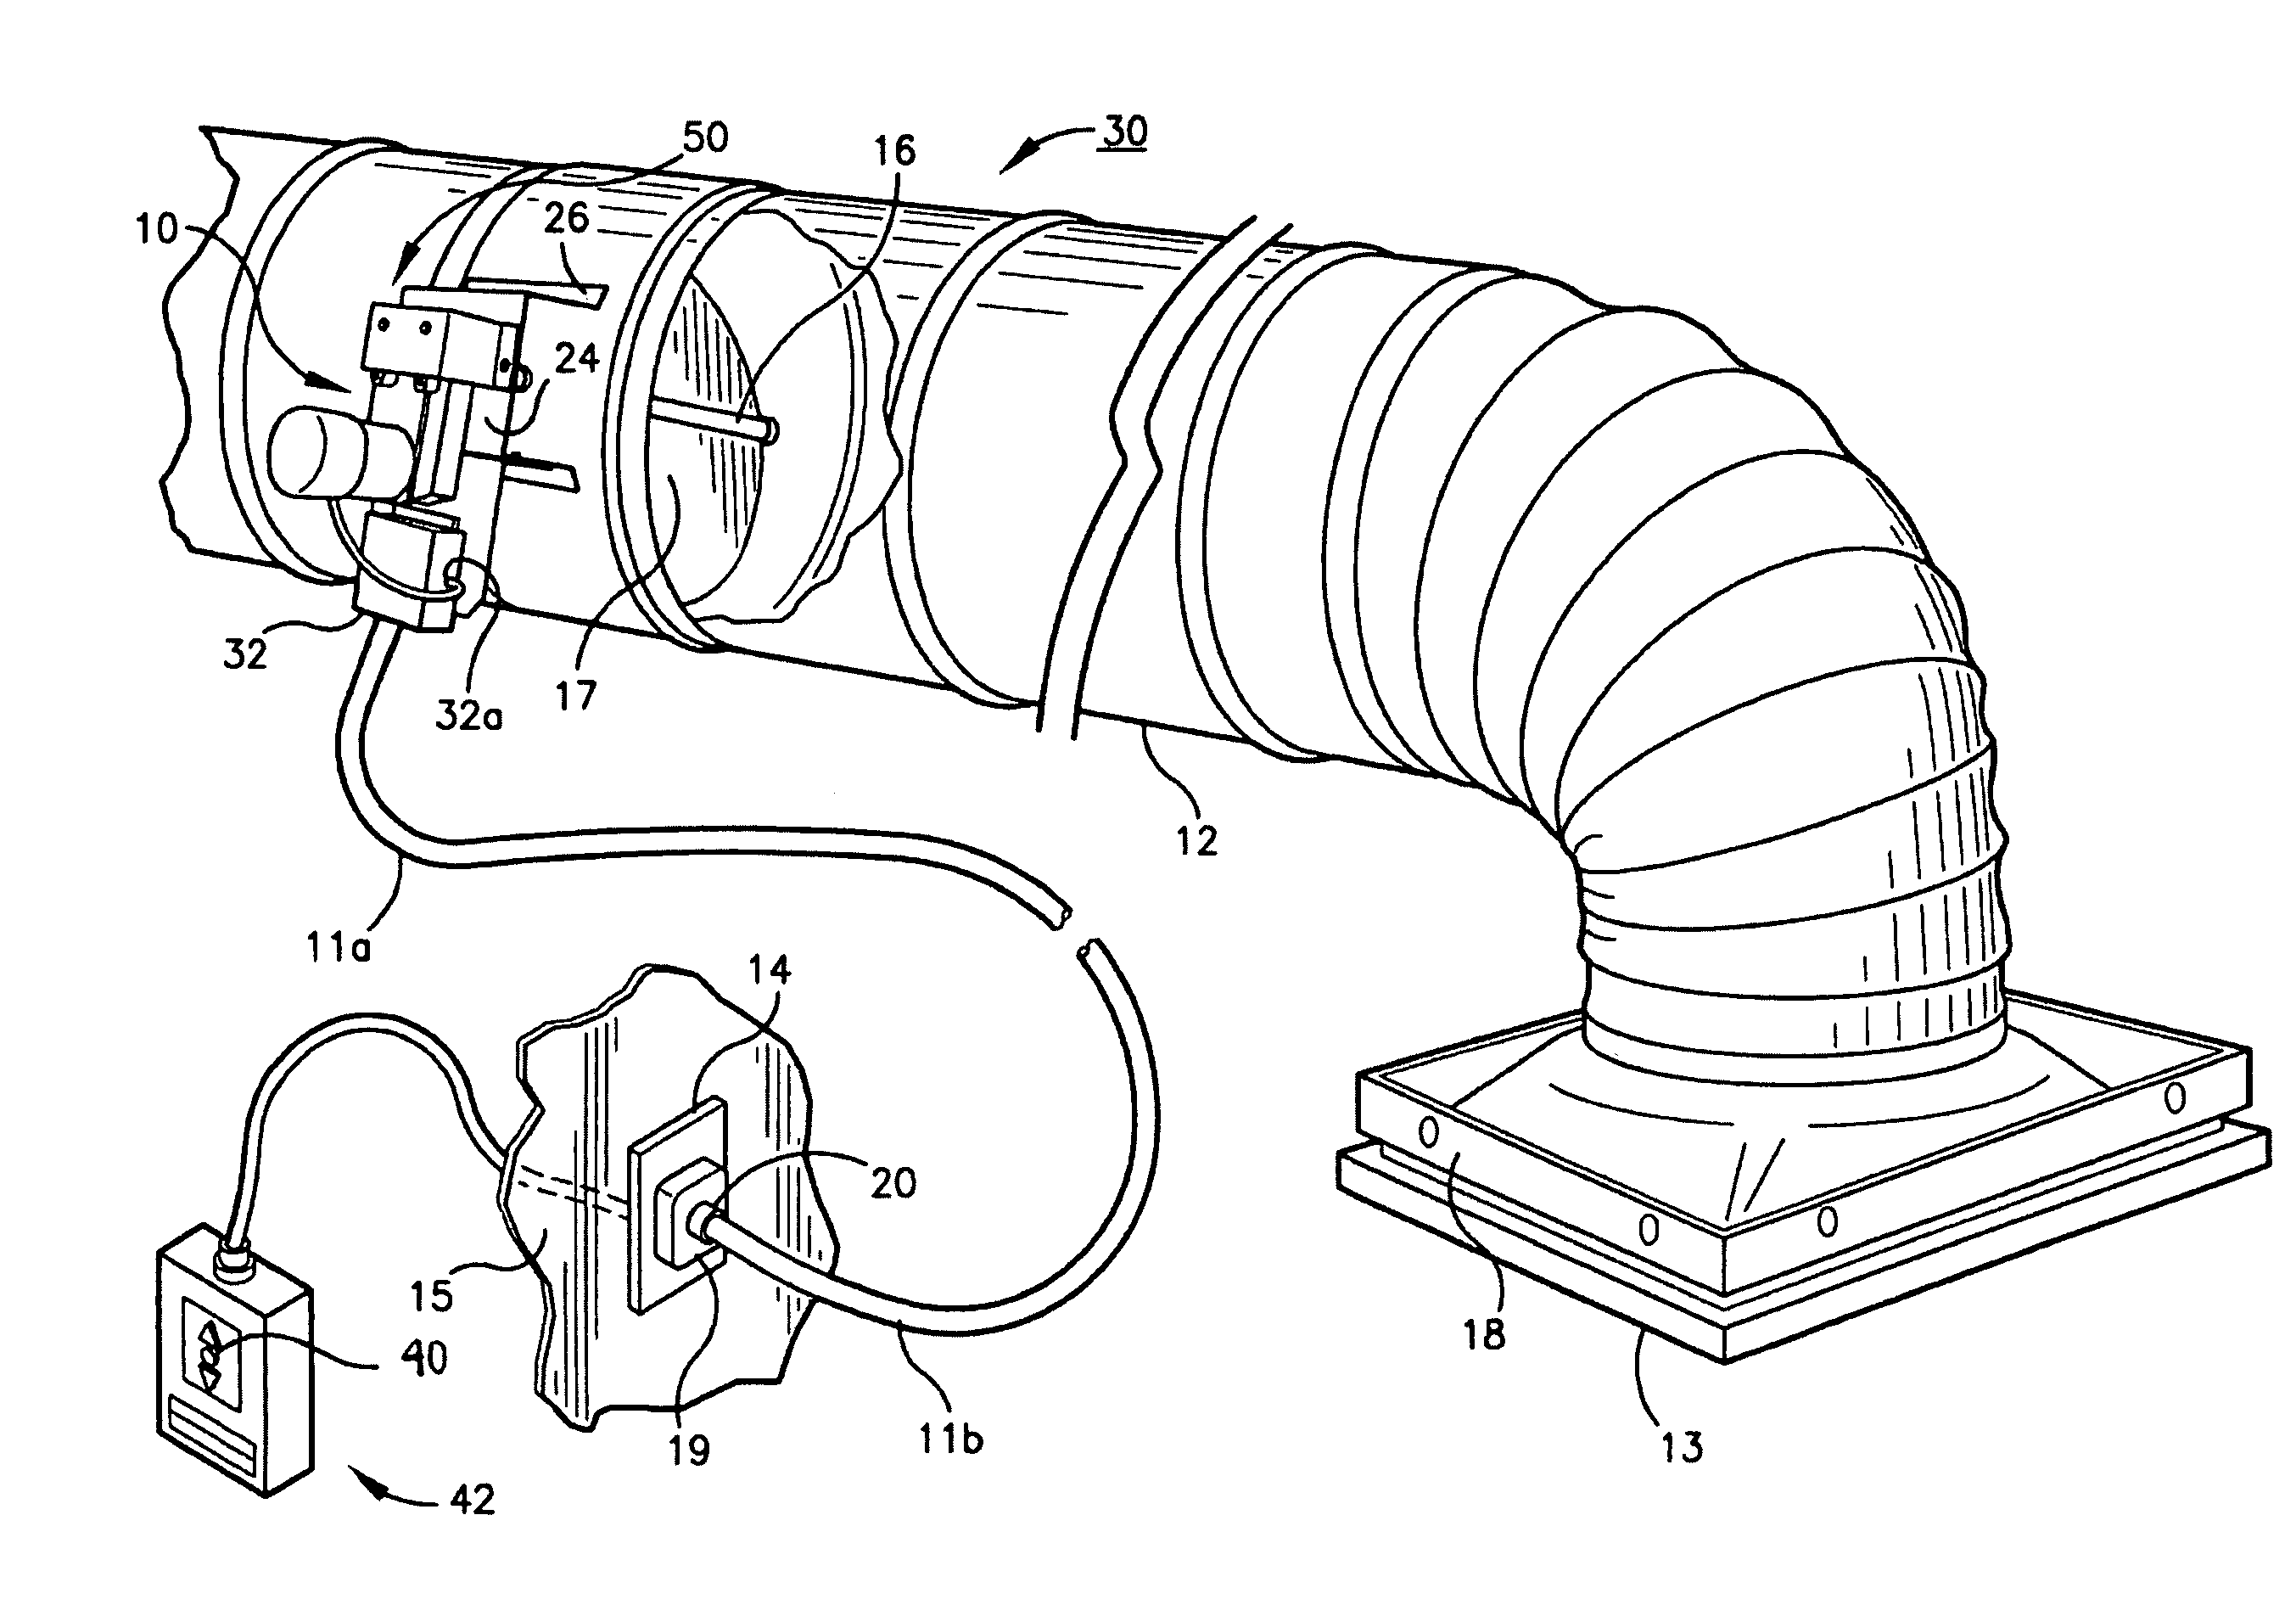 US8038075 Air damper balancing system and method   Patents #3C3C3C